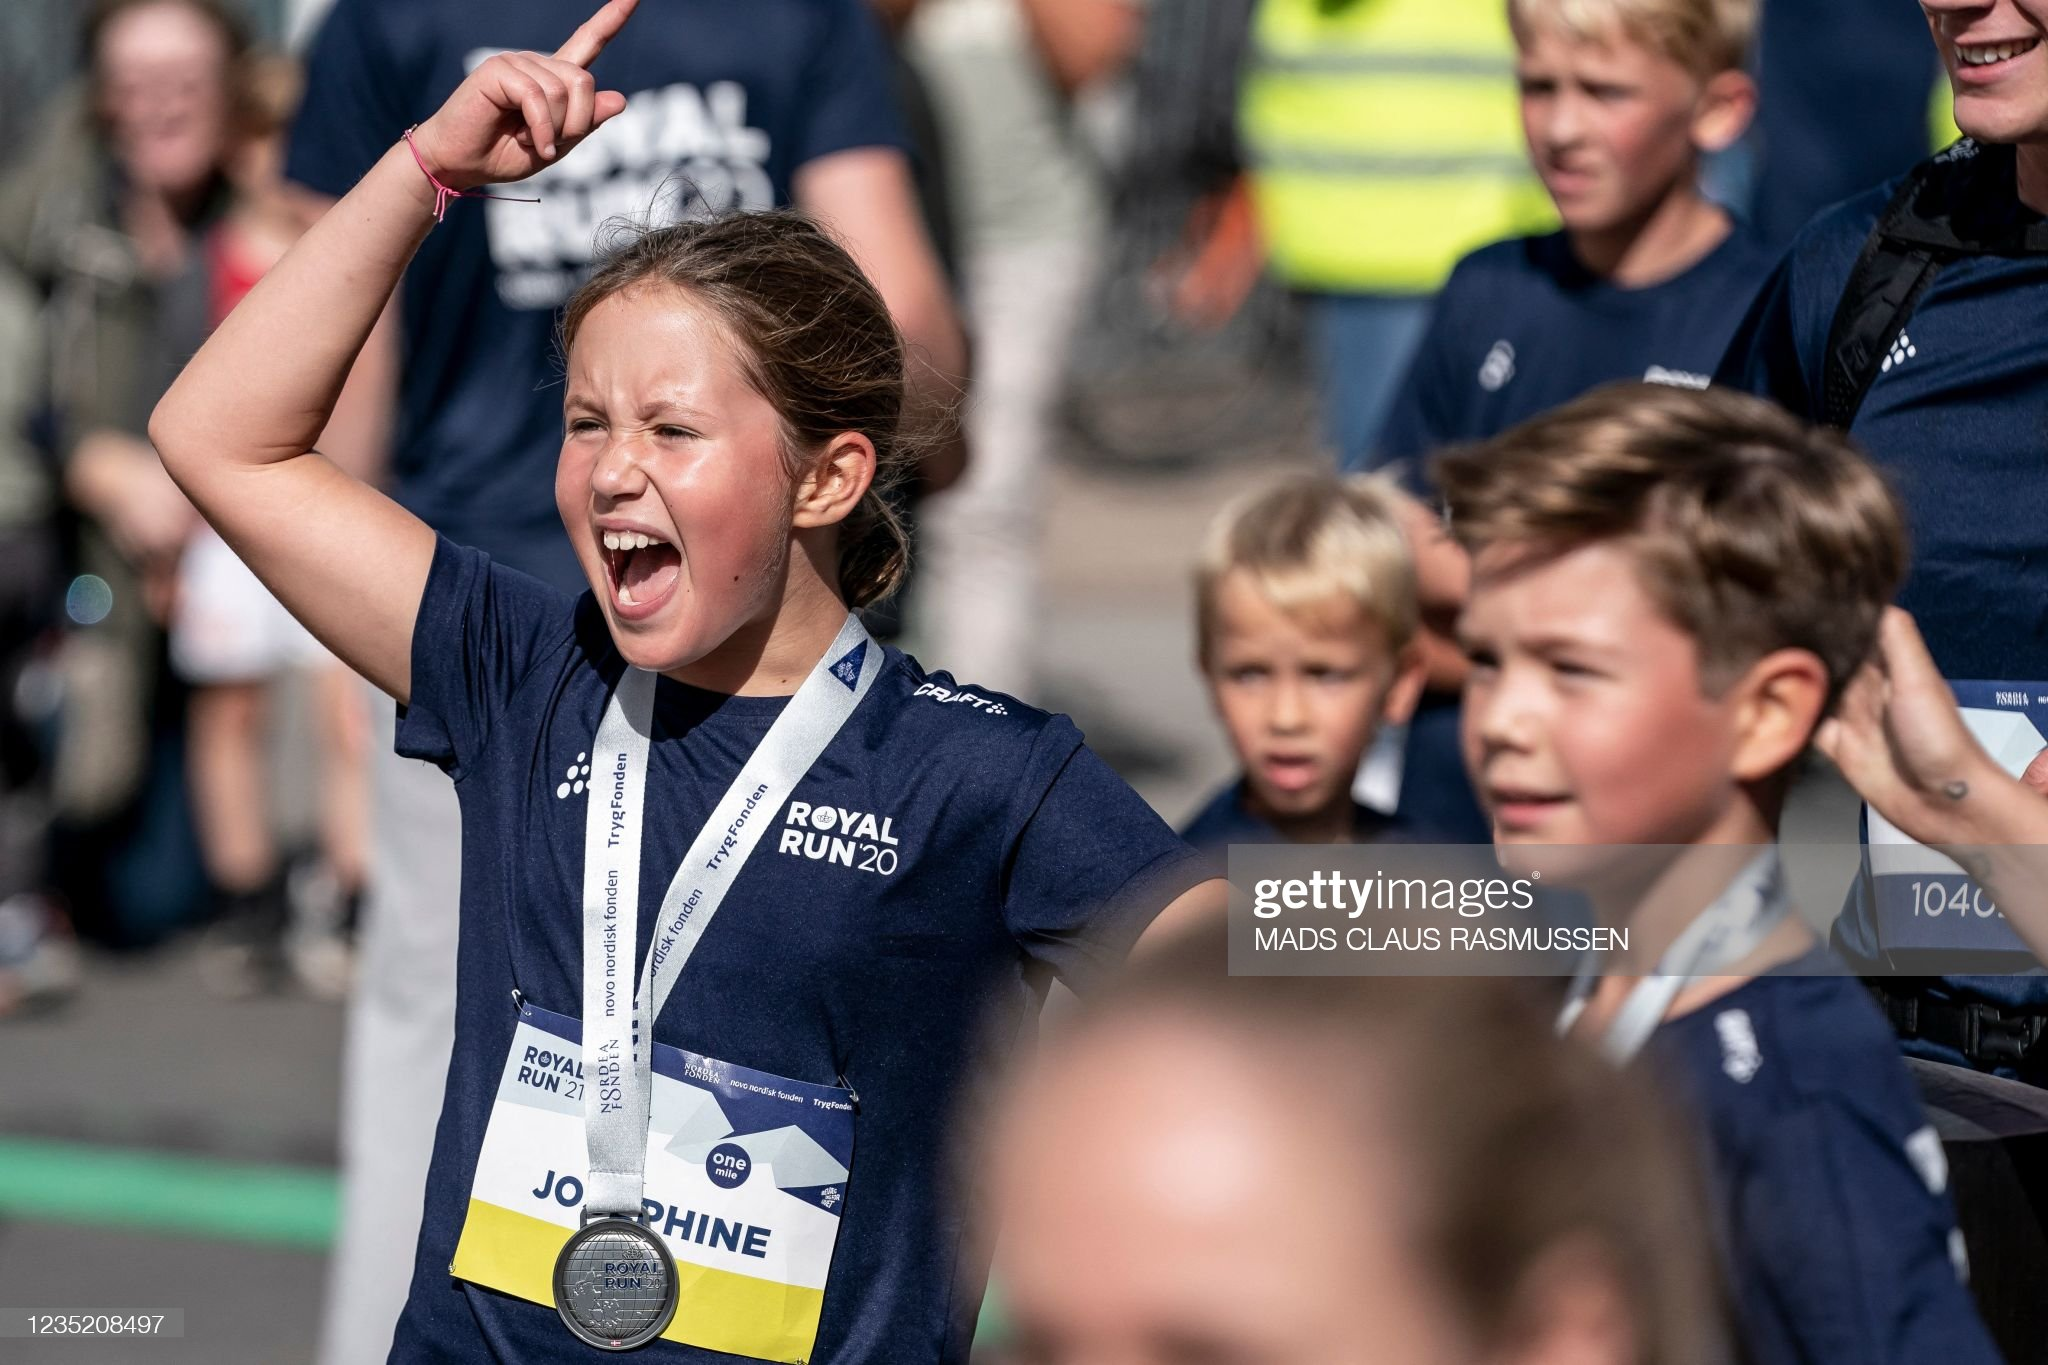 DENMARK-HISTORY-ROYALS-RUN : News Photo